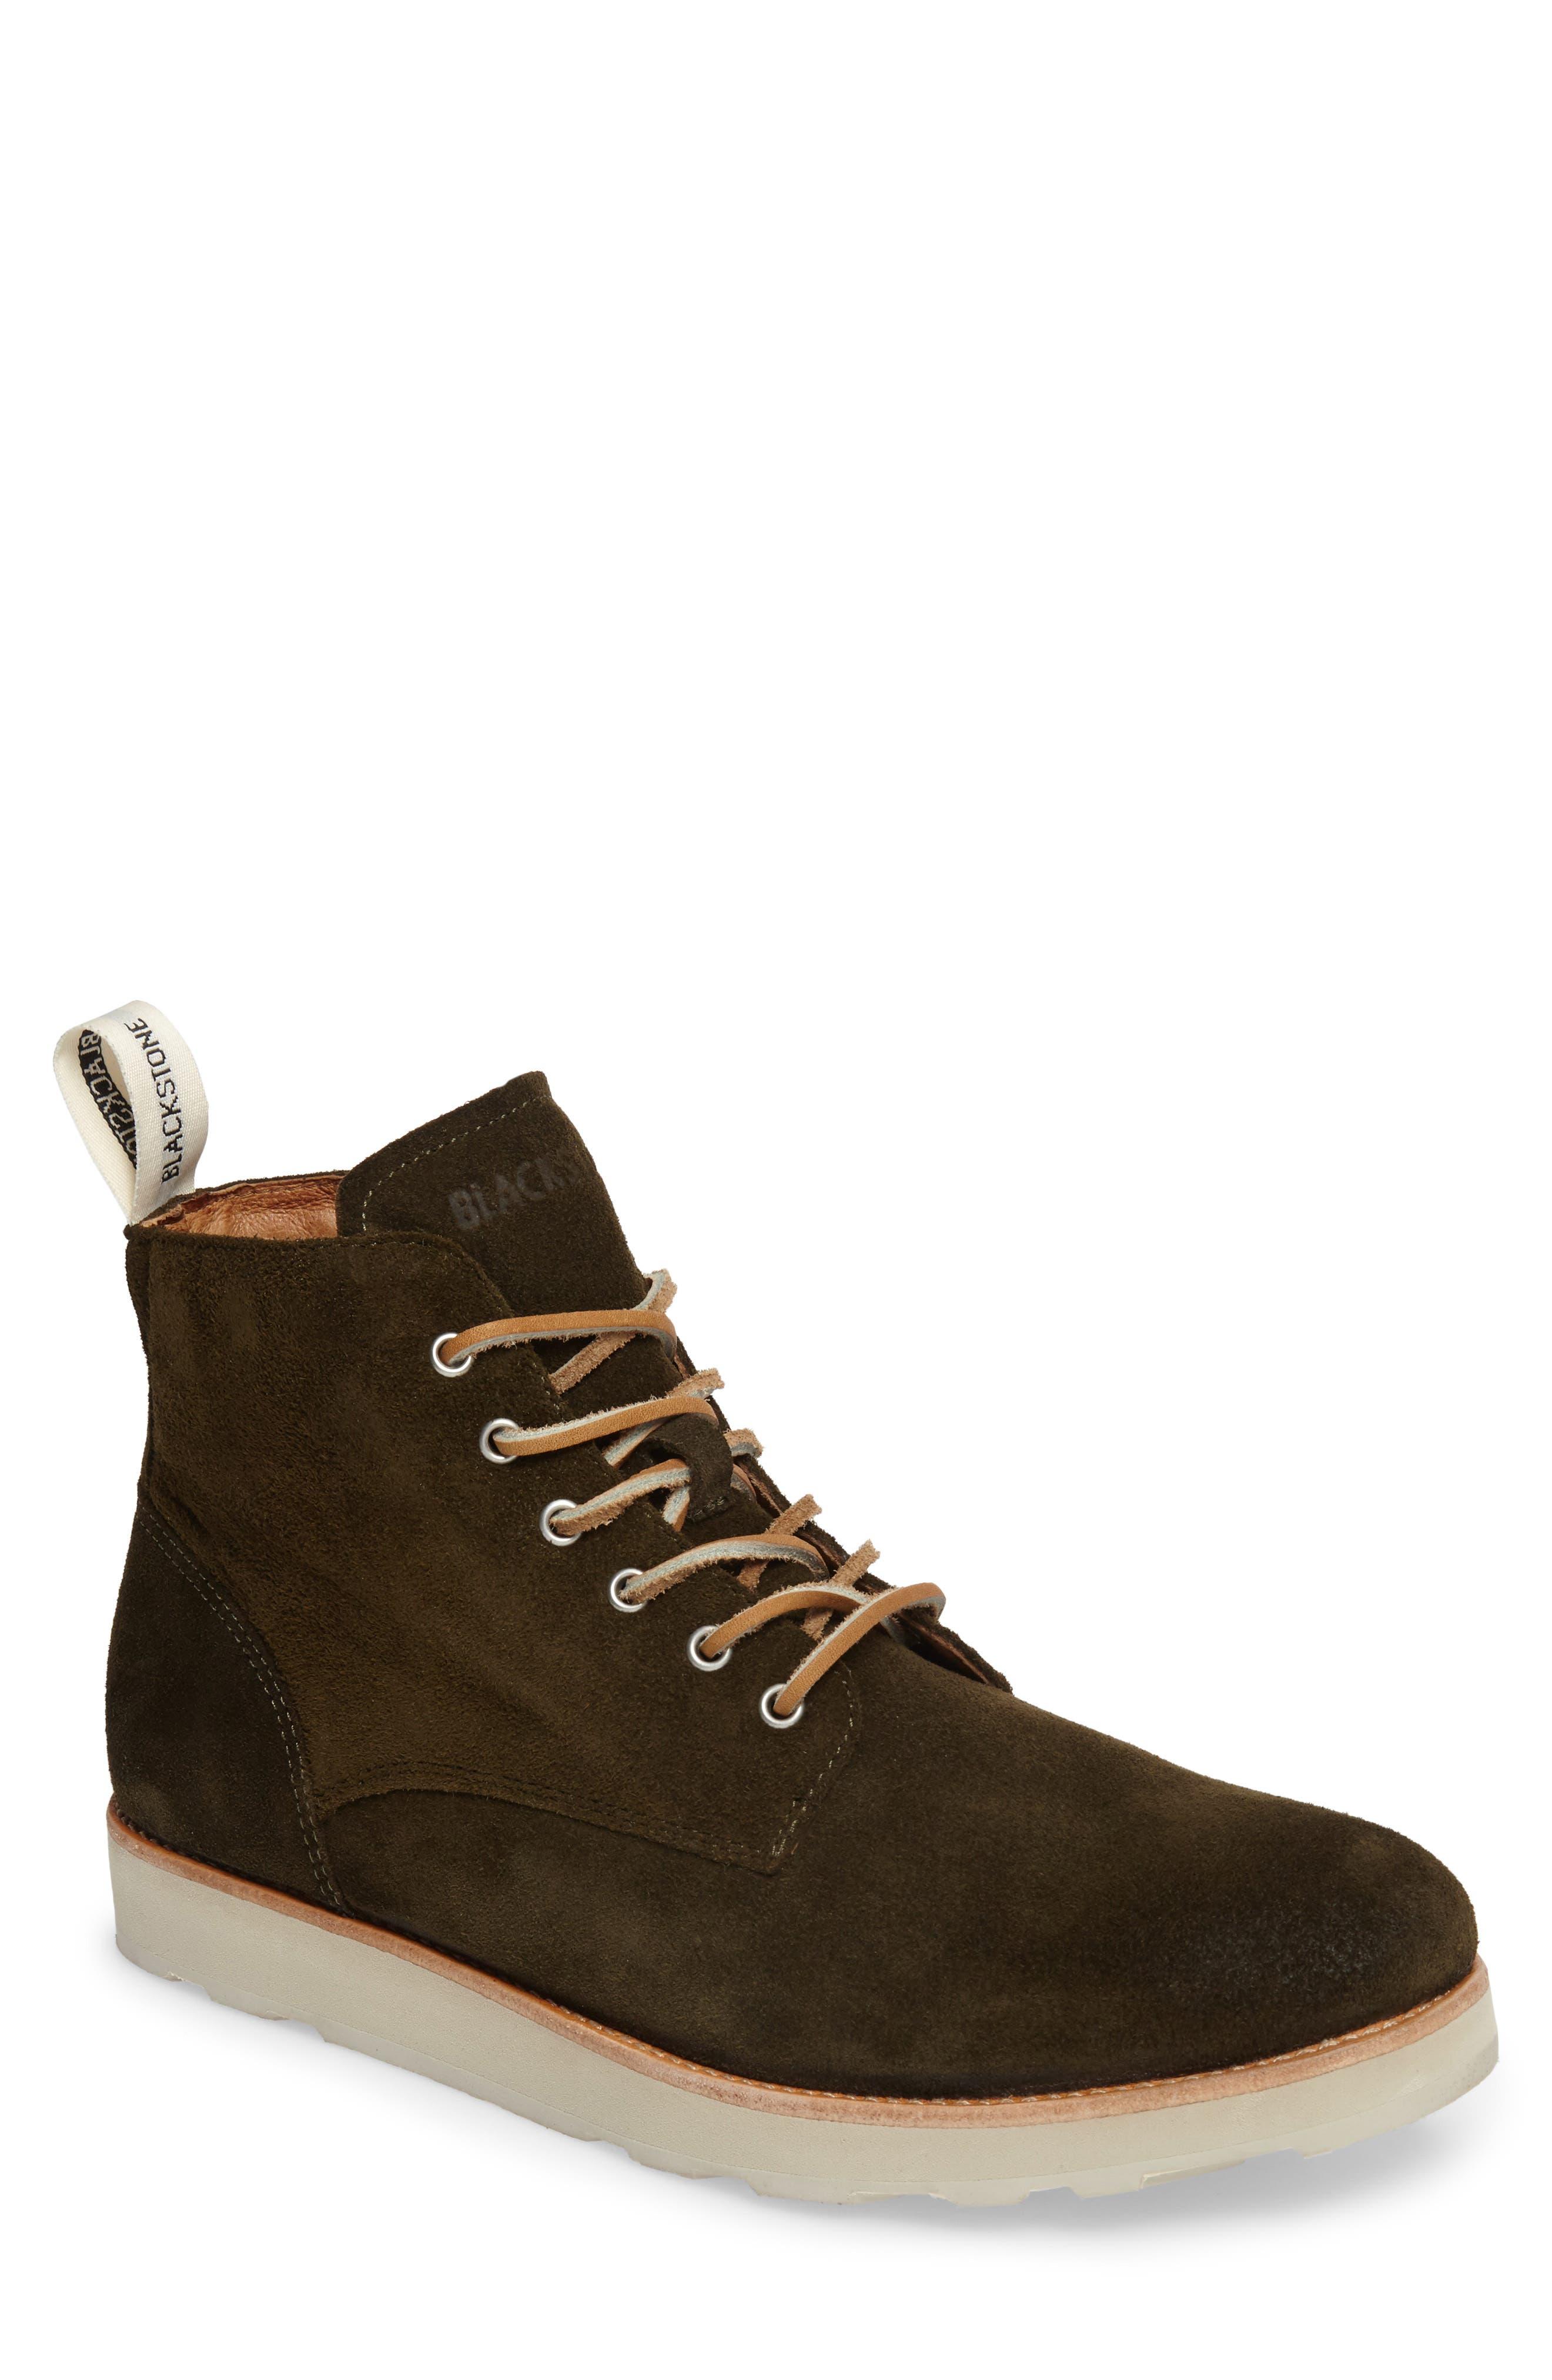 OM 53 Plain Toe Boot,                             Main thumbnail 1, color,                             Dark Green Leather